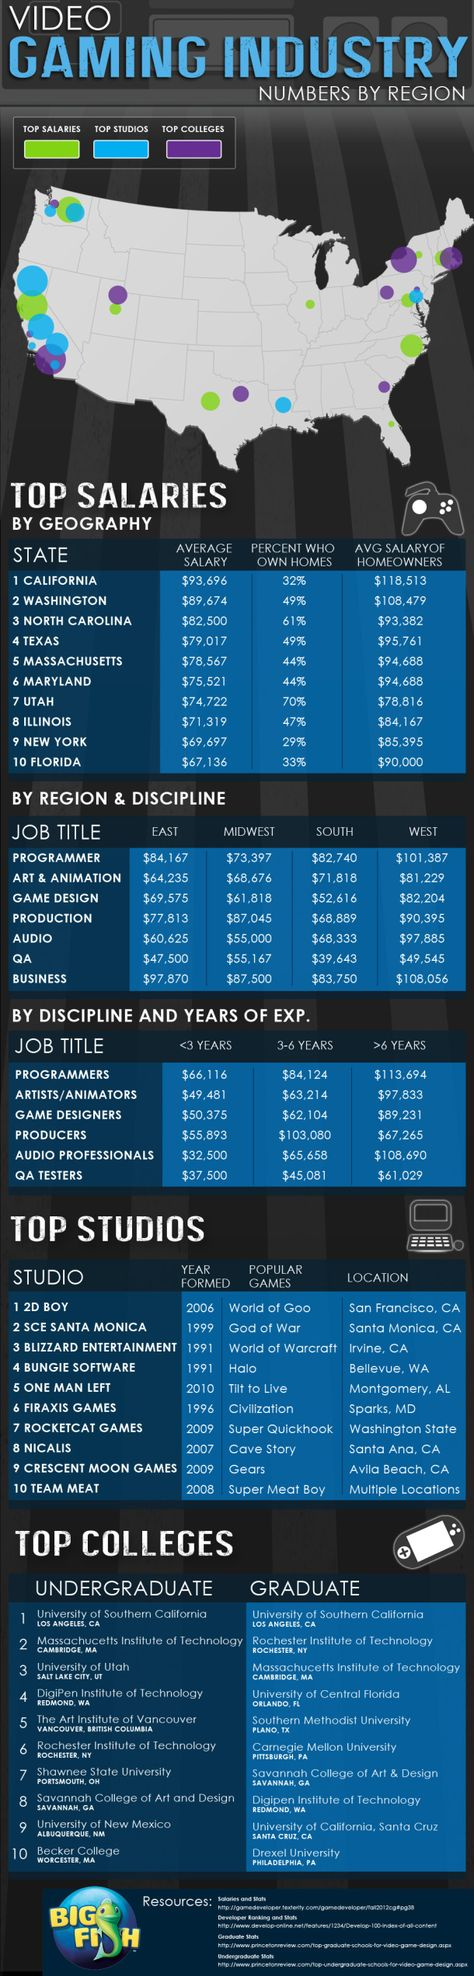 Video Gaming Industry: Numbers by Region[INFOGRAPHIC] #videogaming #industry #numbers